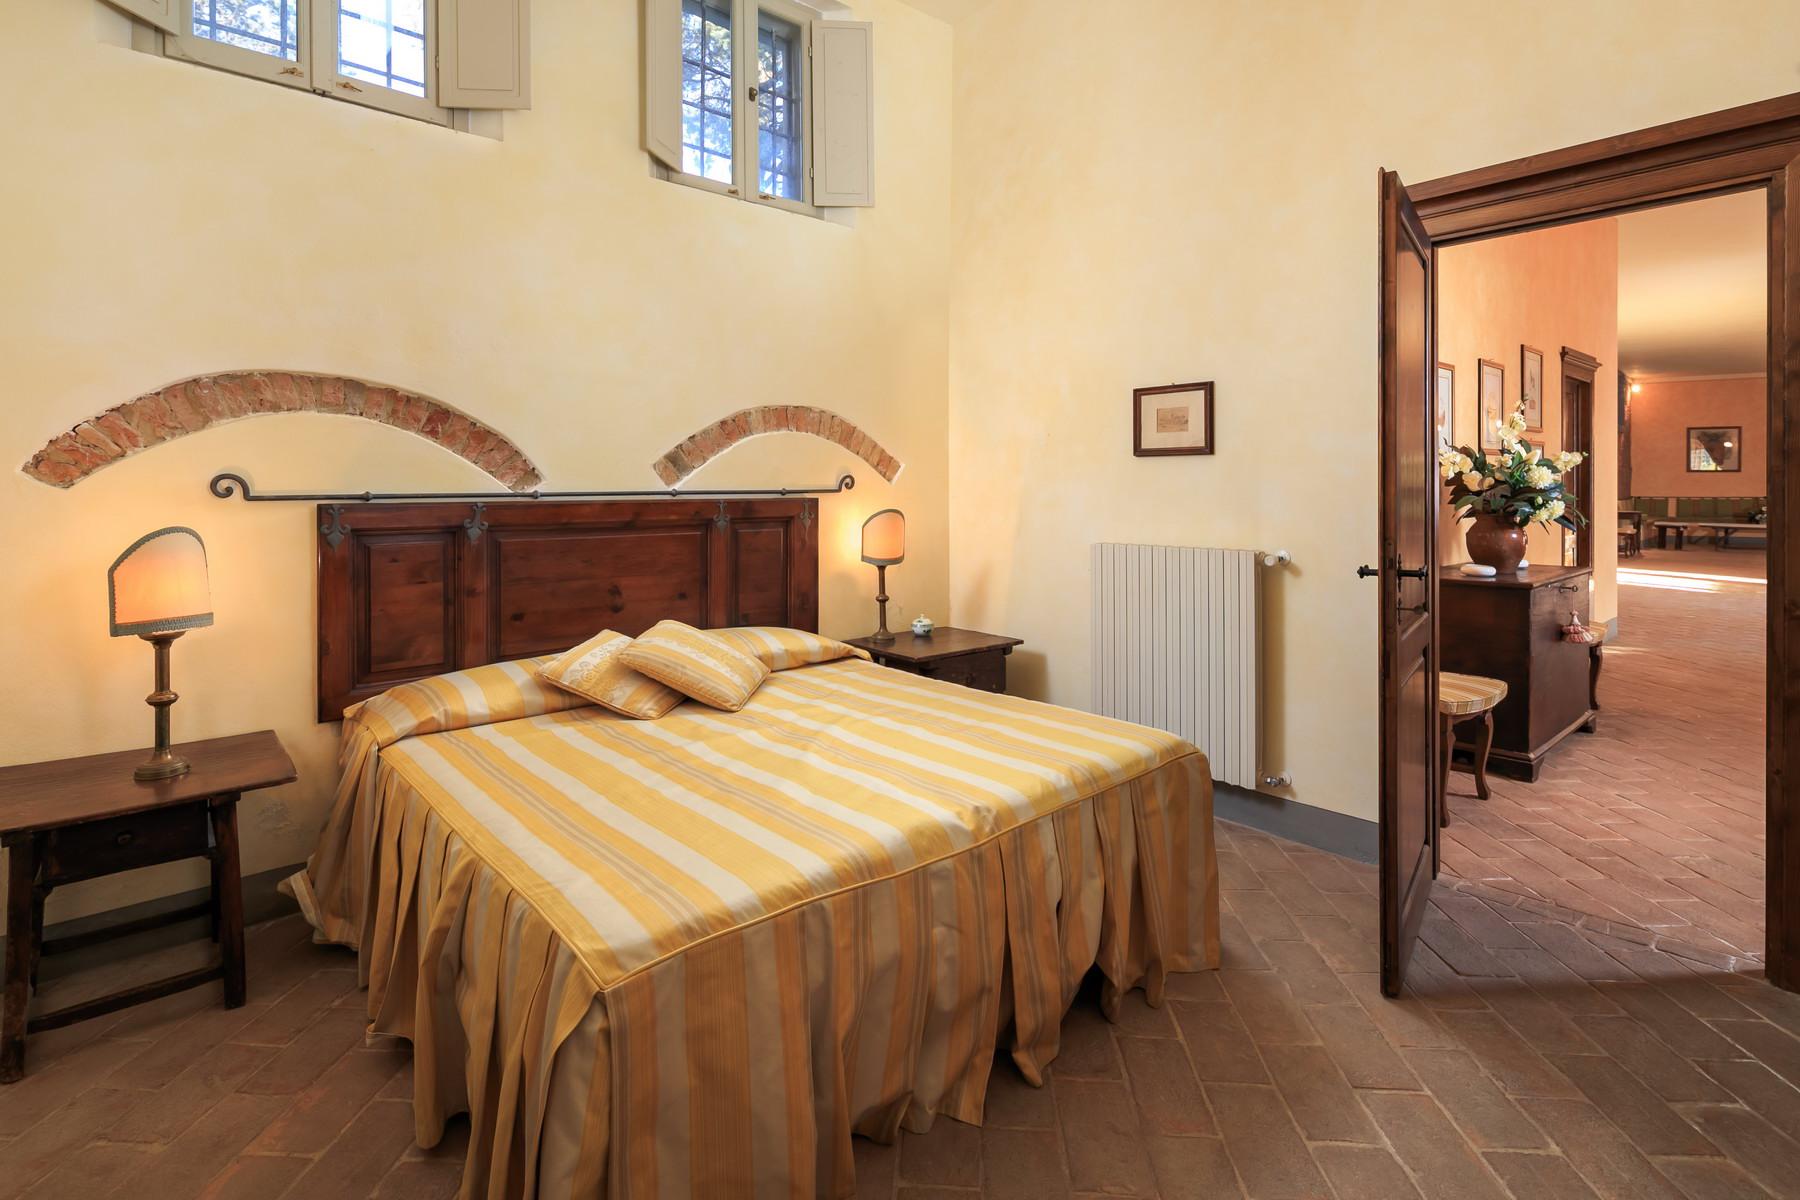 Villa in Vendita a Casciana Terme Lari: 5 locali, 550 mq - Foto 23